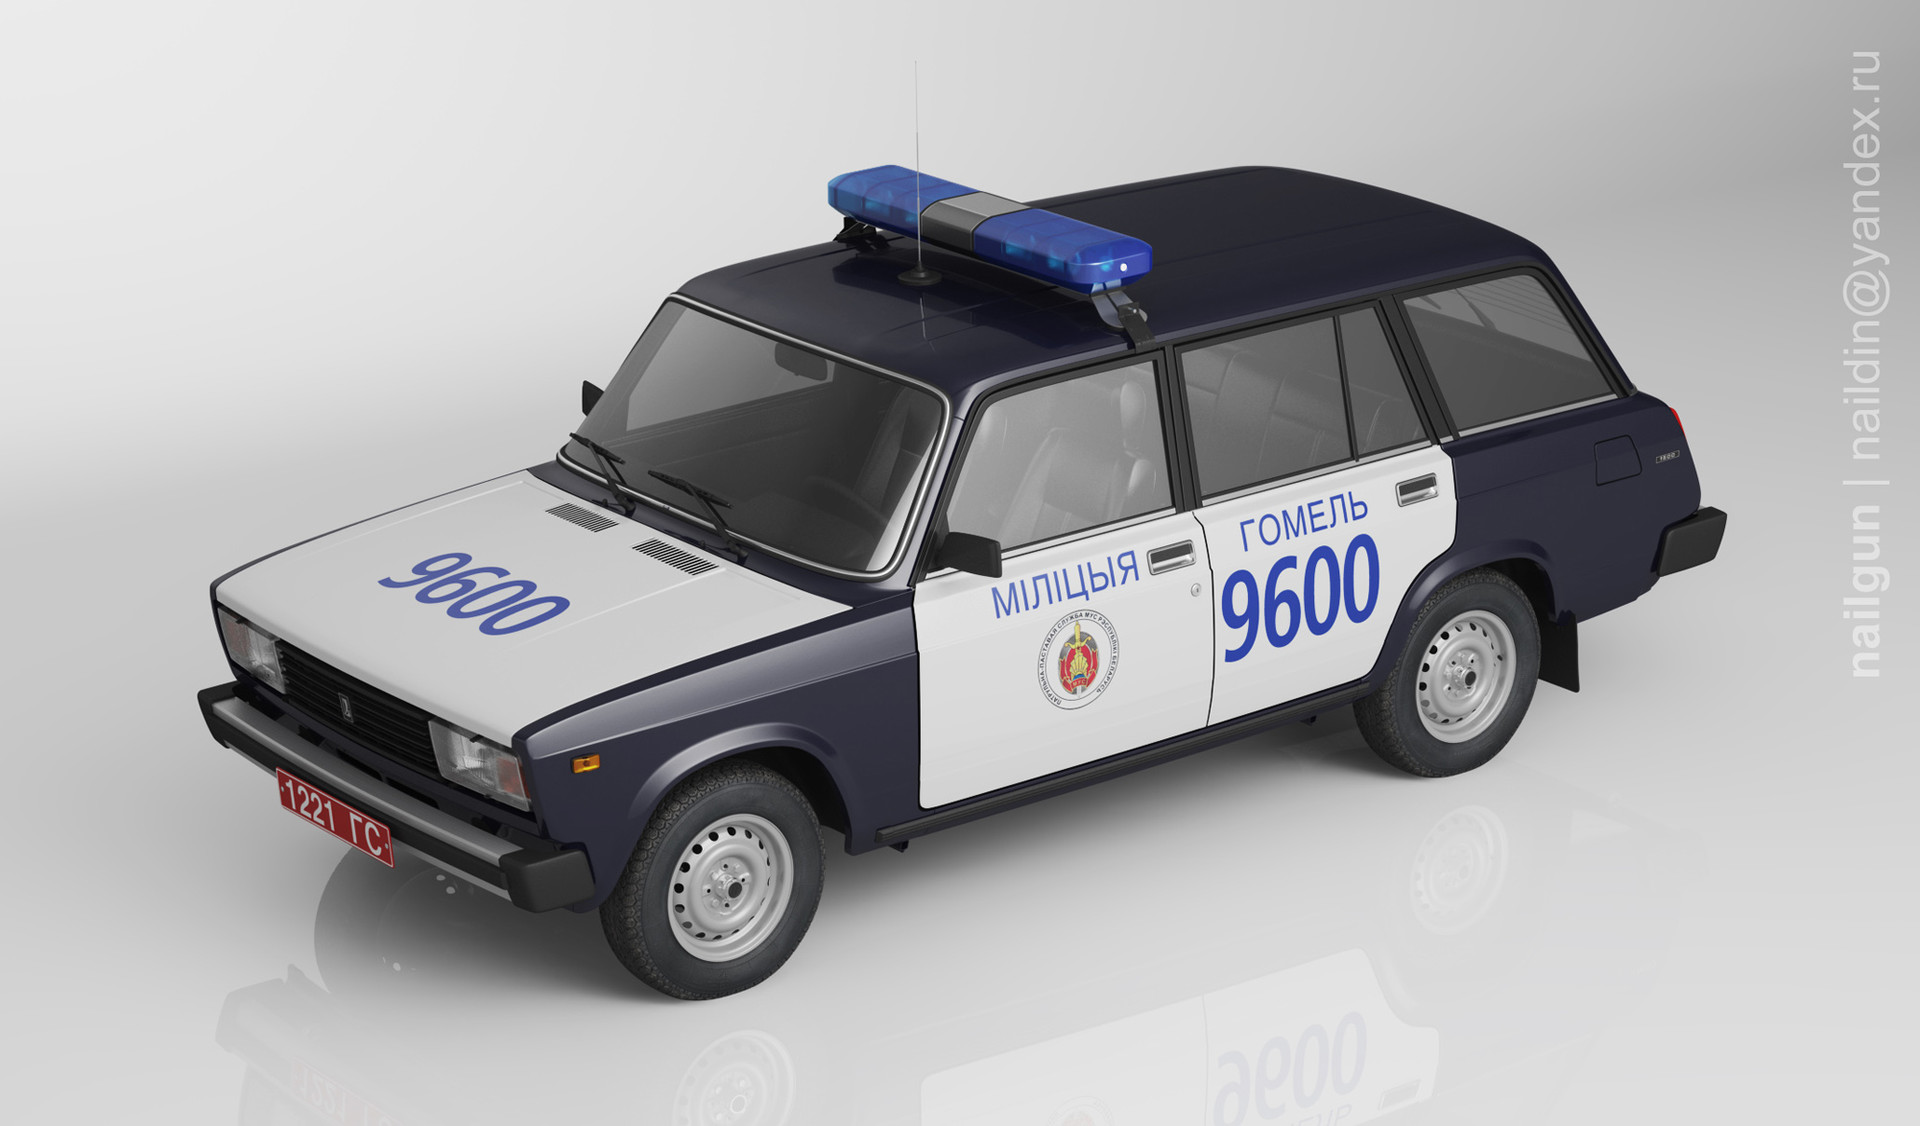 Nail khusnutdinov pwc 056 000 vaz 2104 miniature